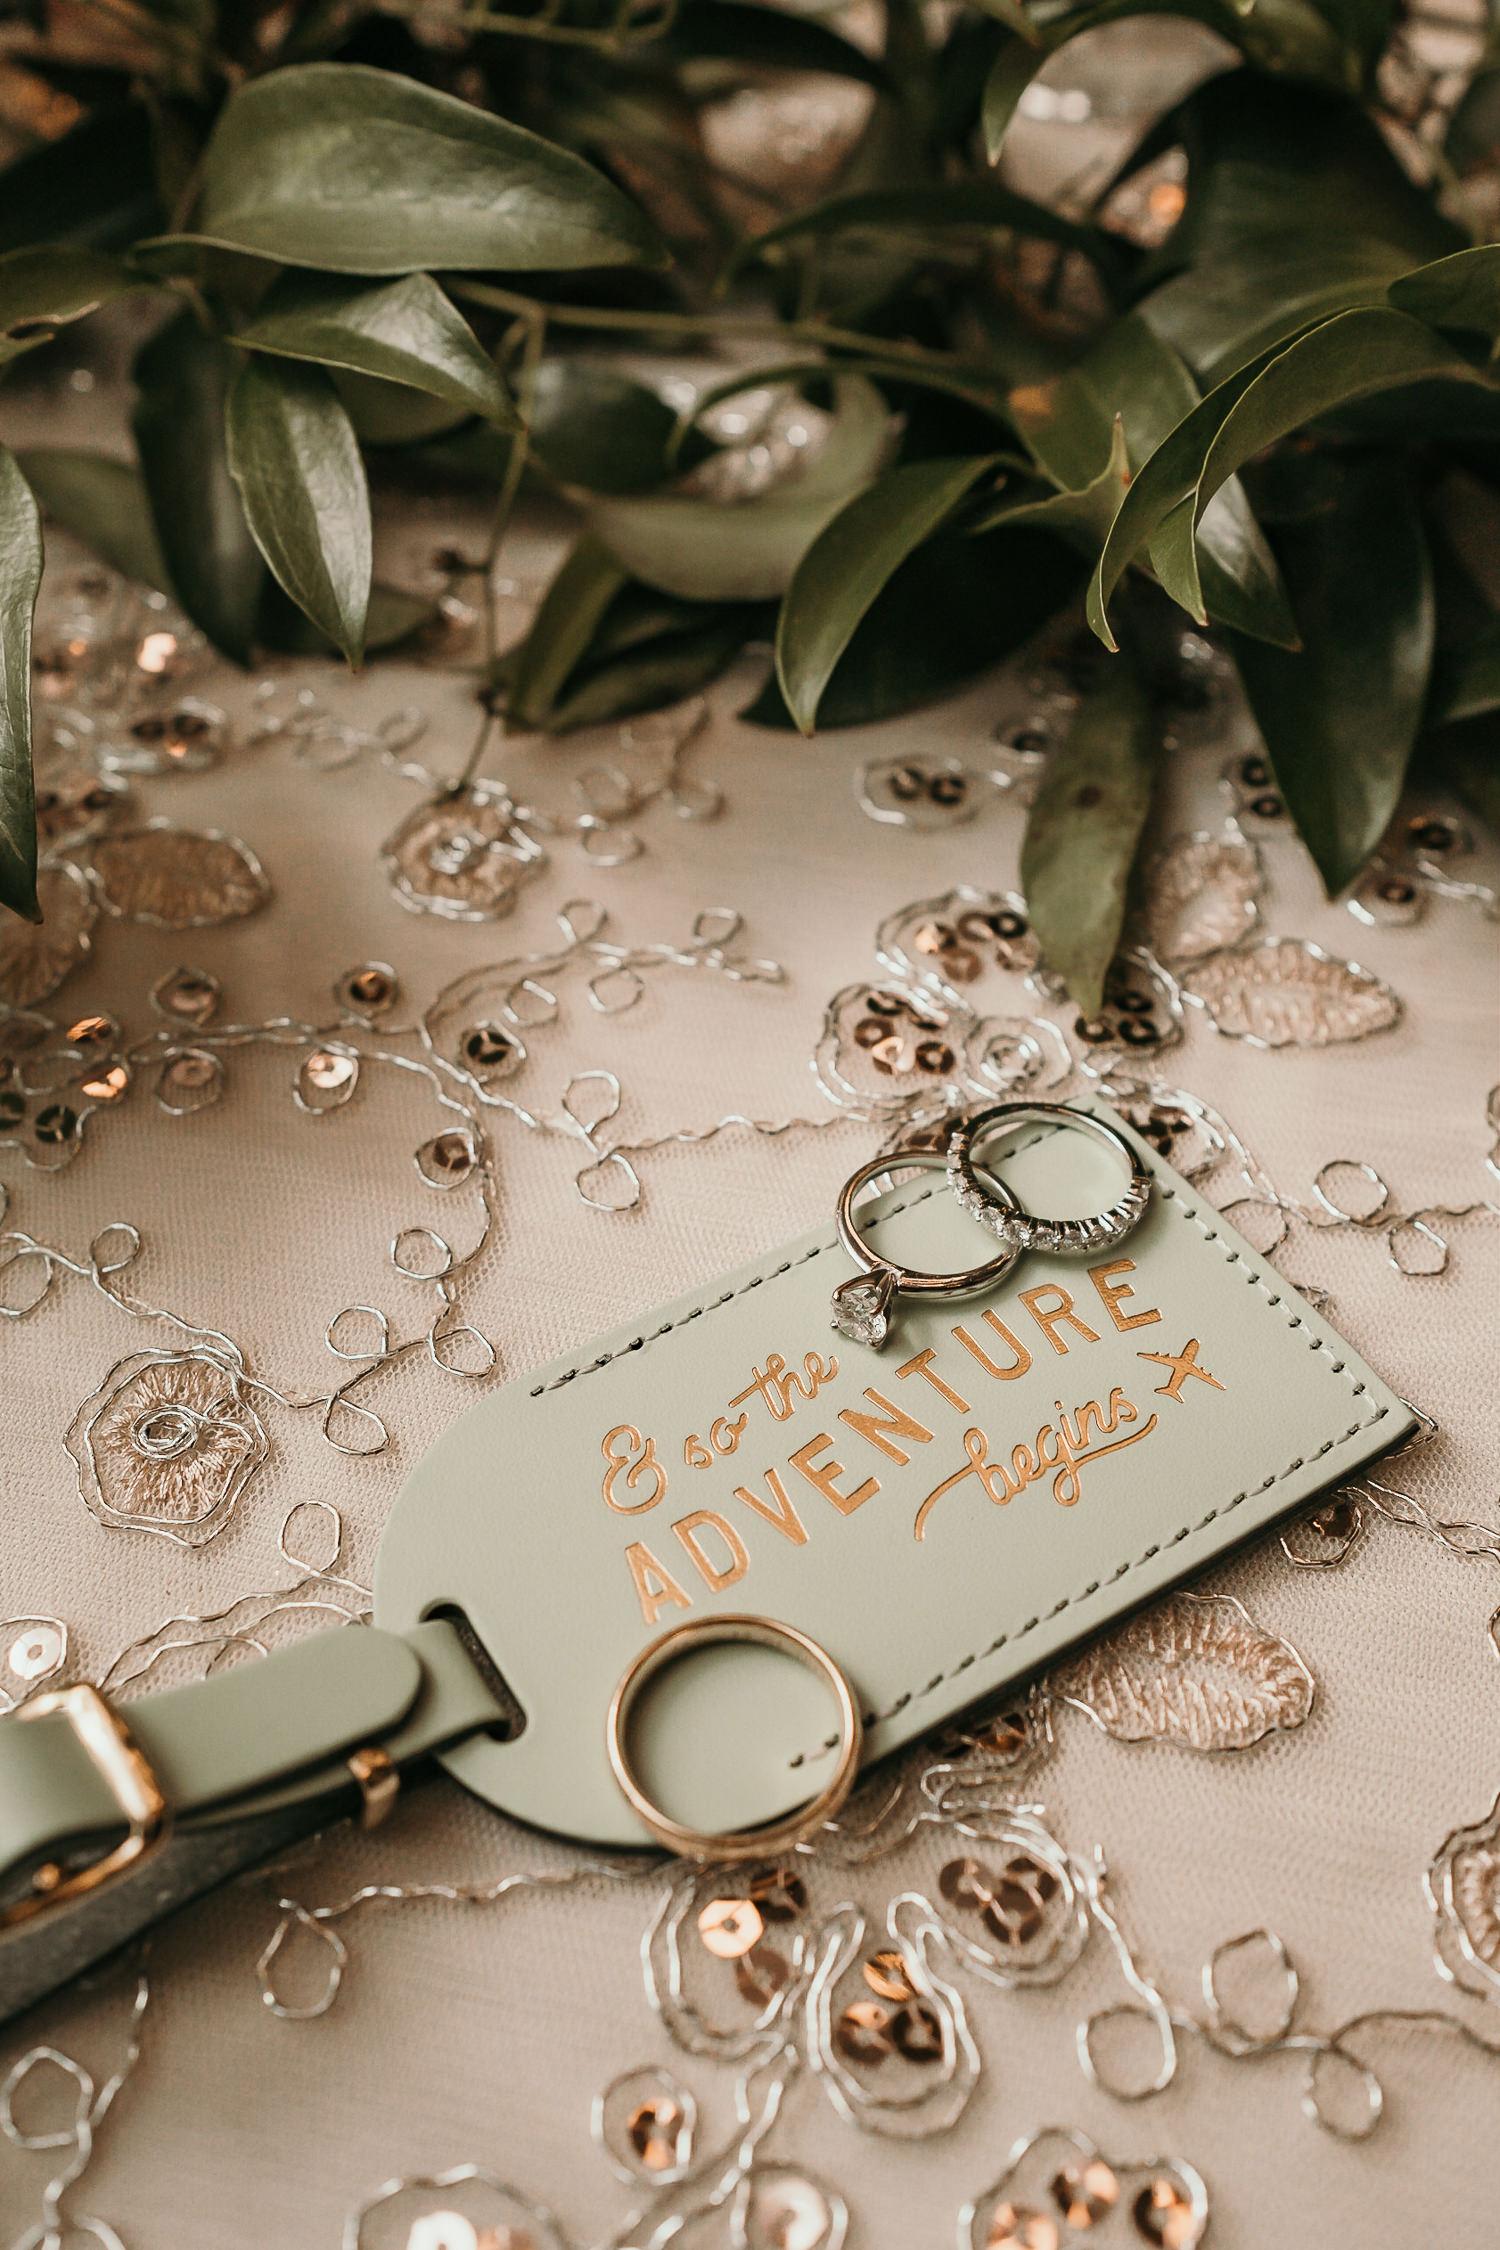 macro of wedding rings on suitcase tag